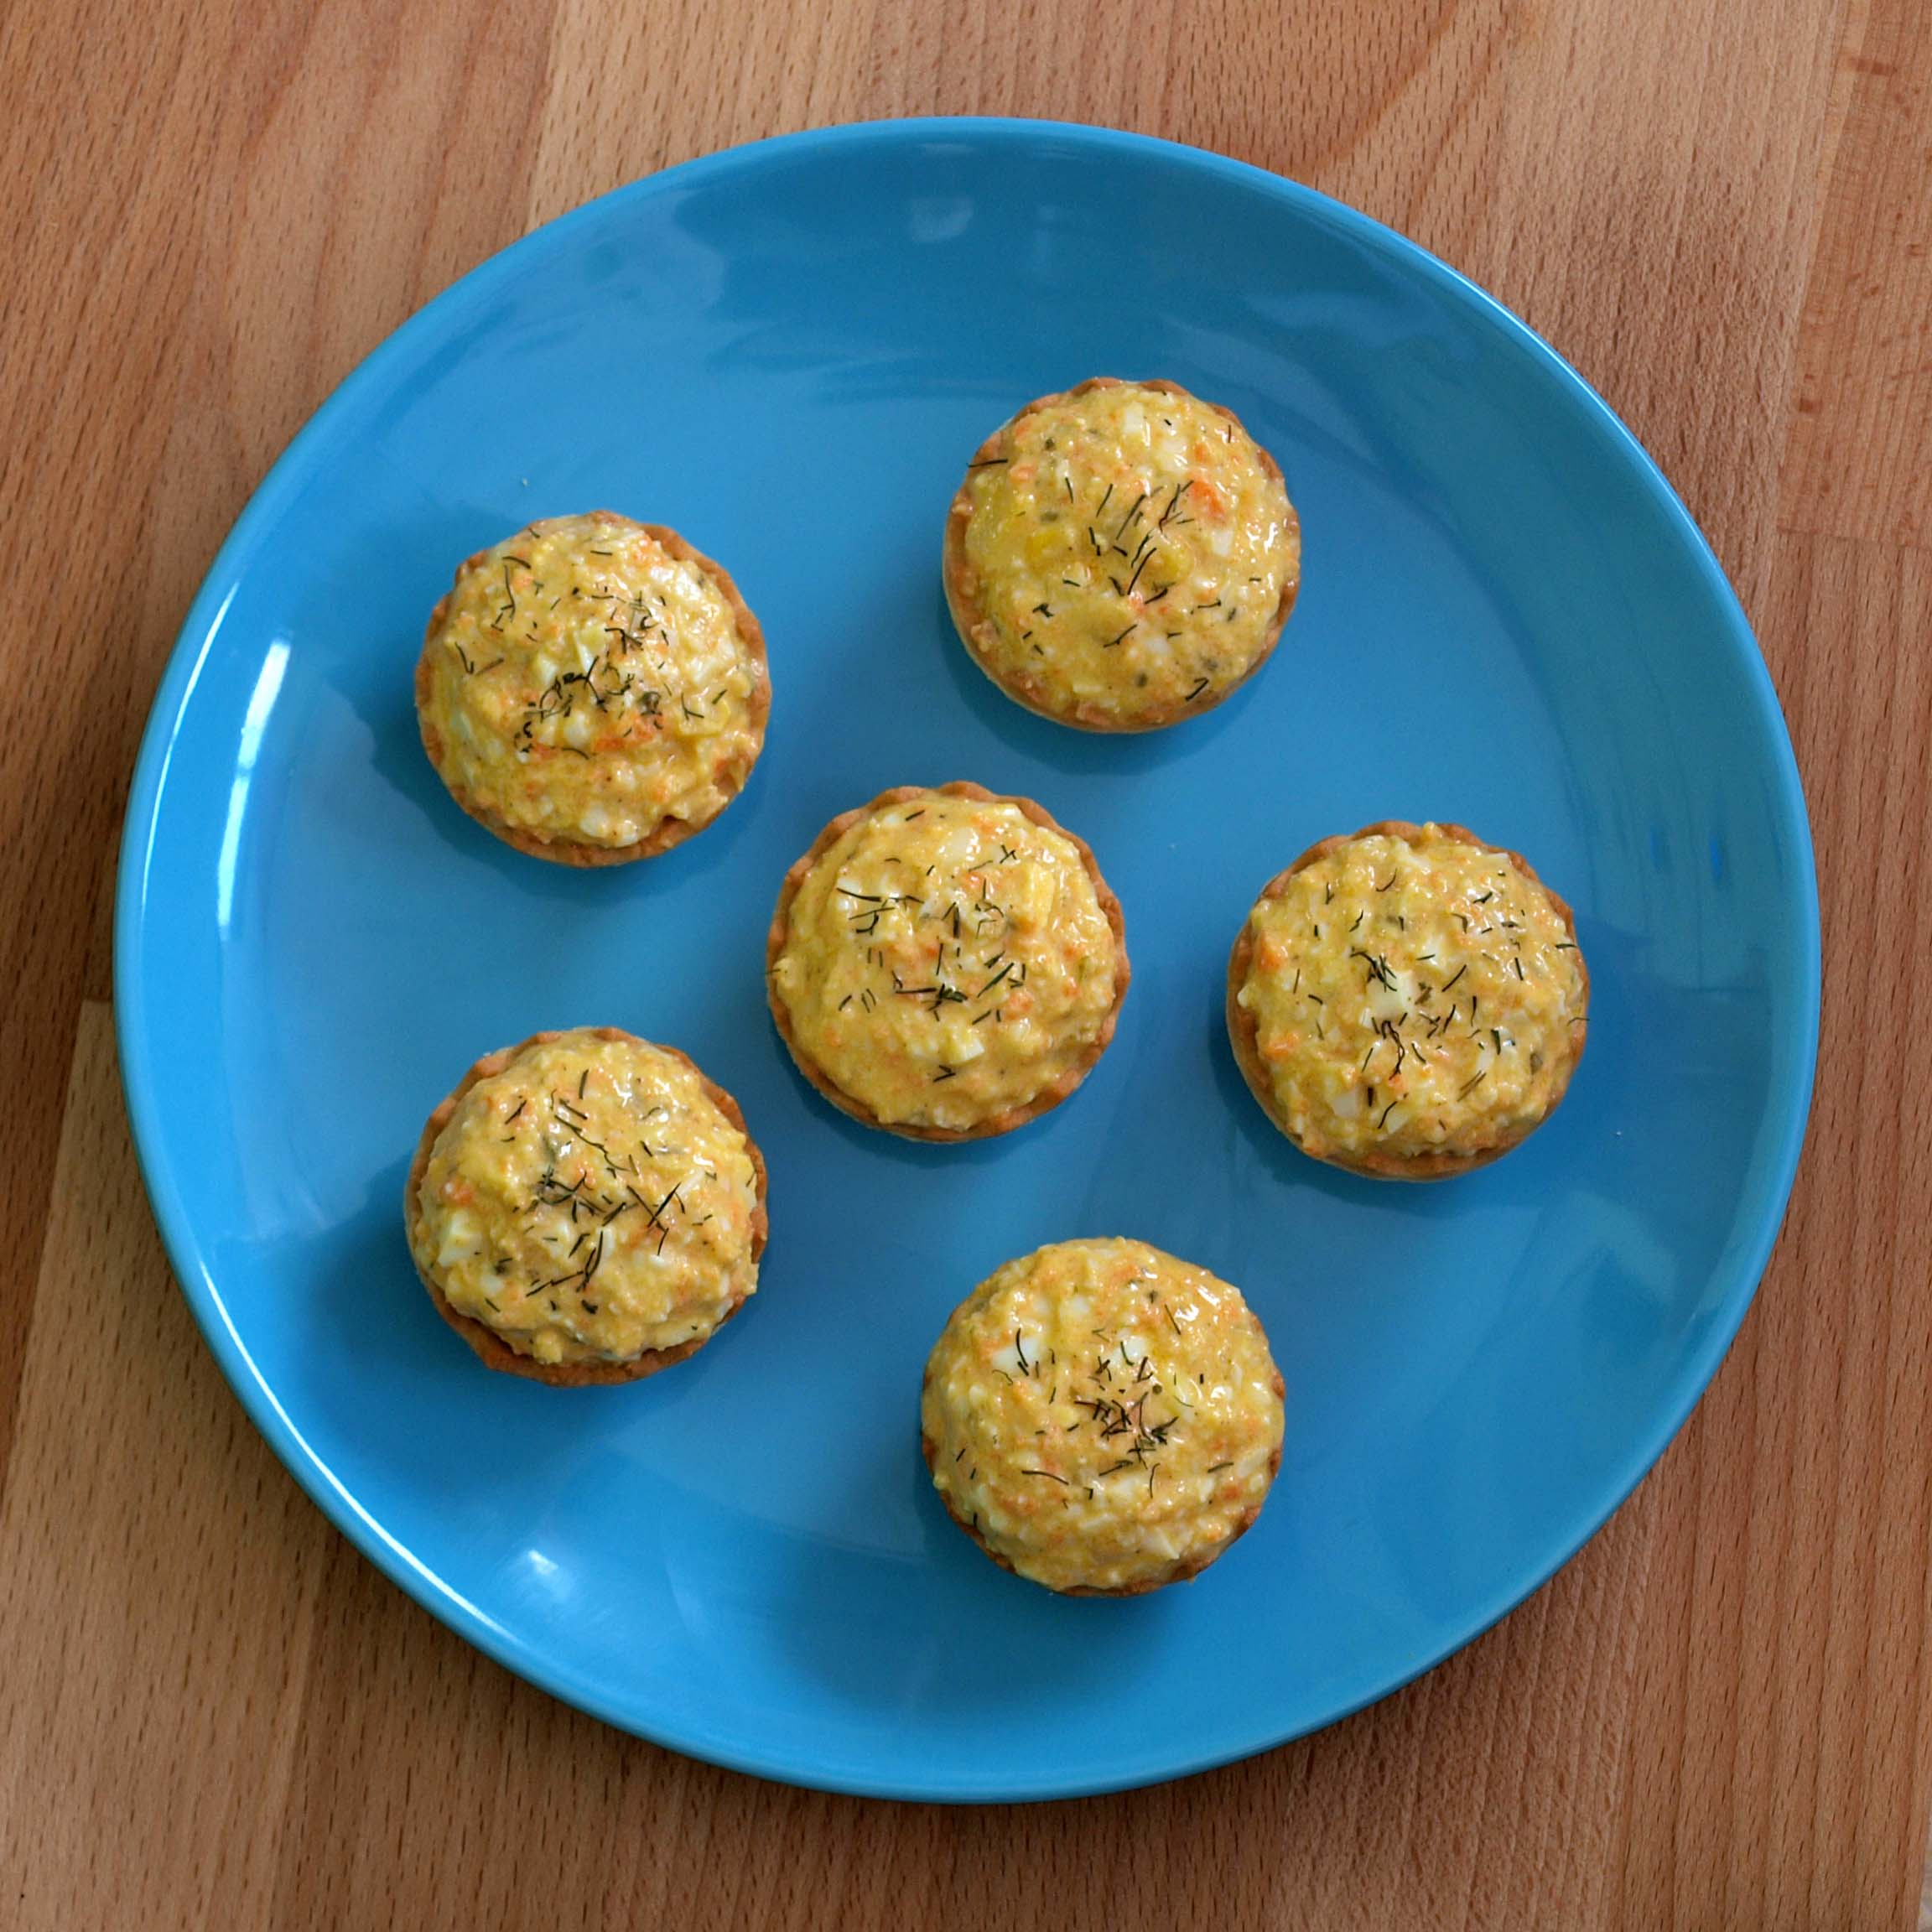 Receta vegetariana de tartaletas de ensaladilla de huevo